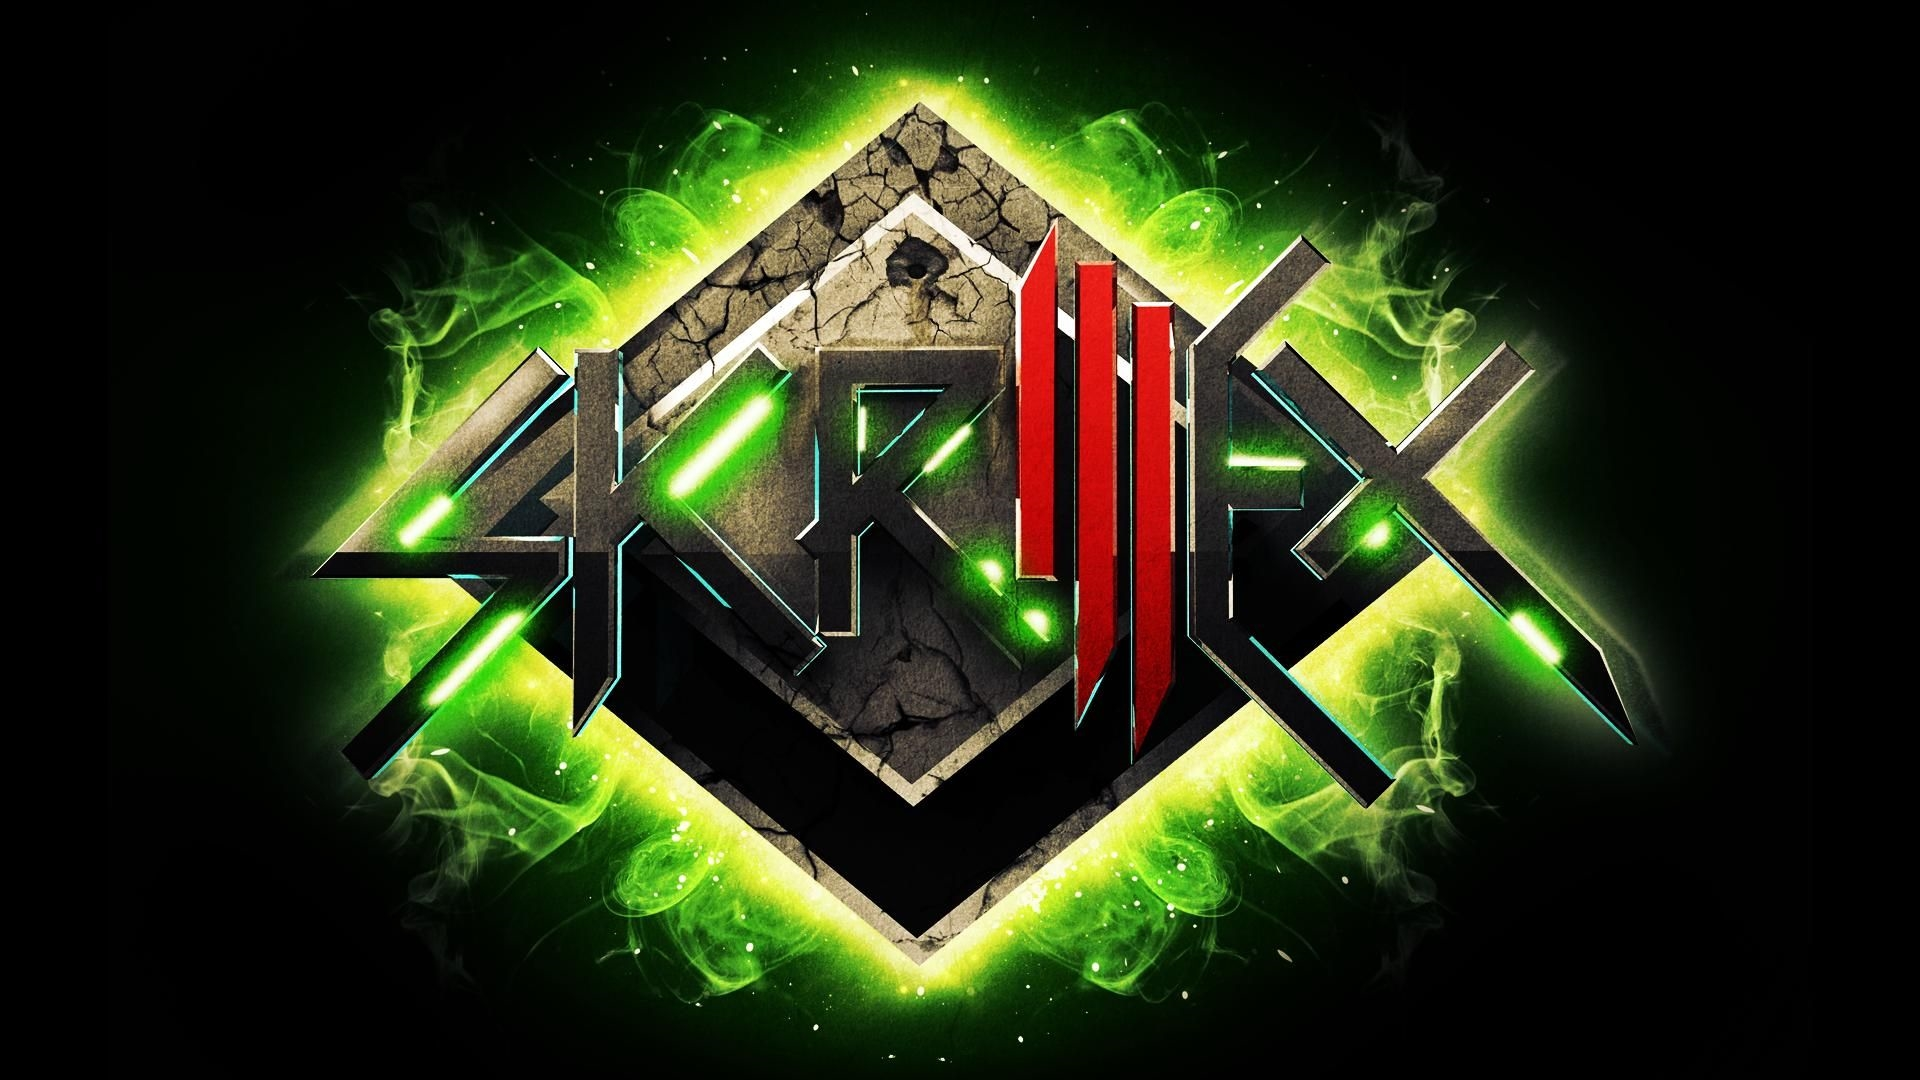 Skrillex Wallpaper Download